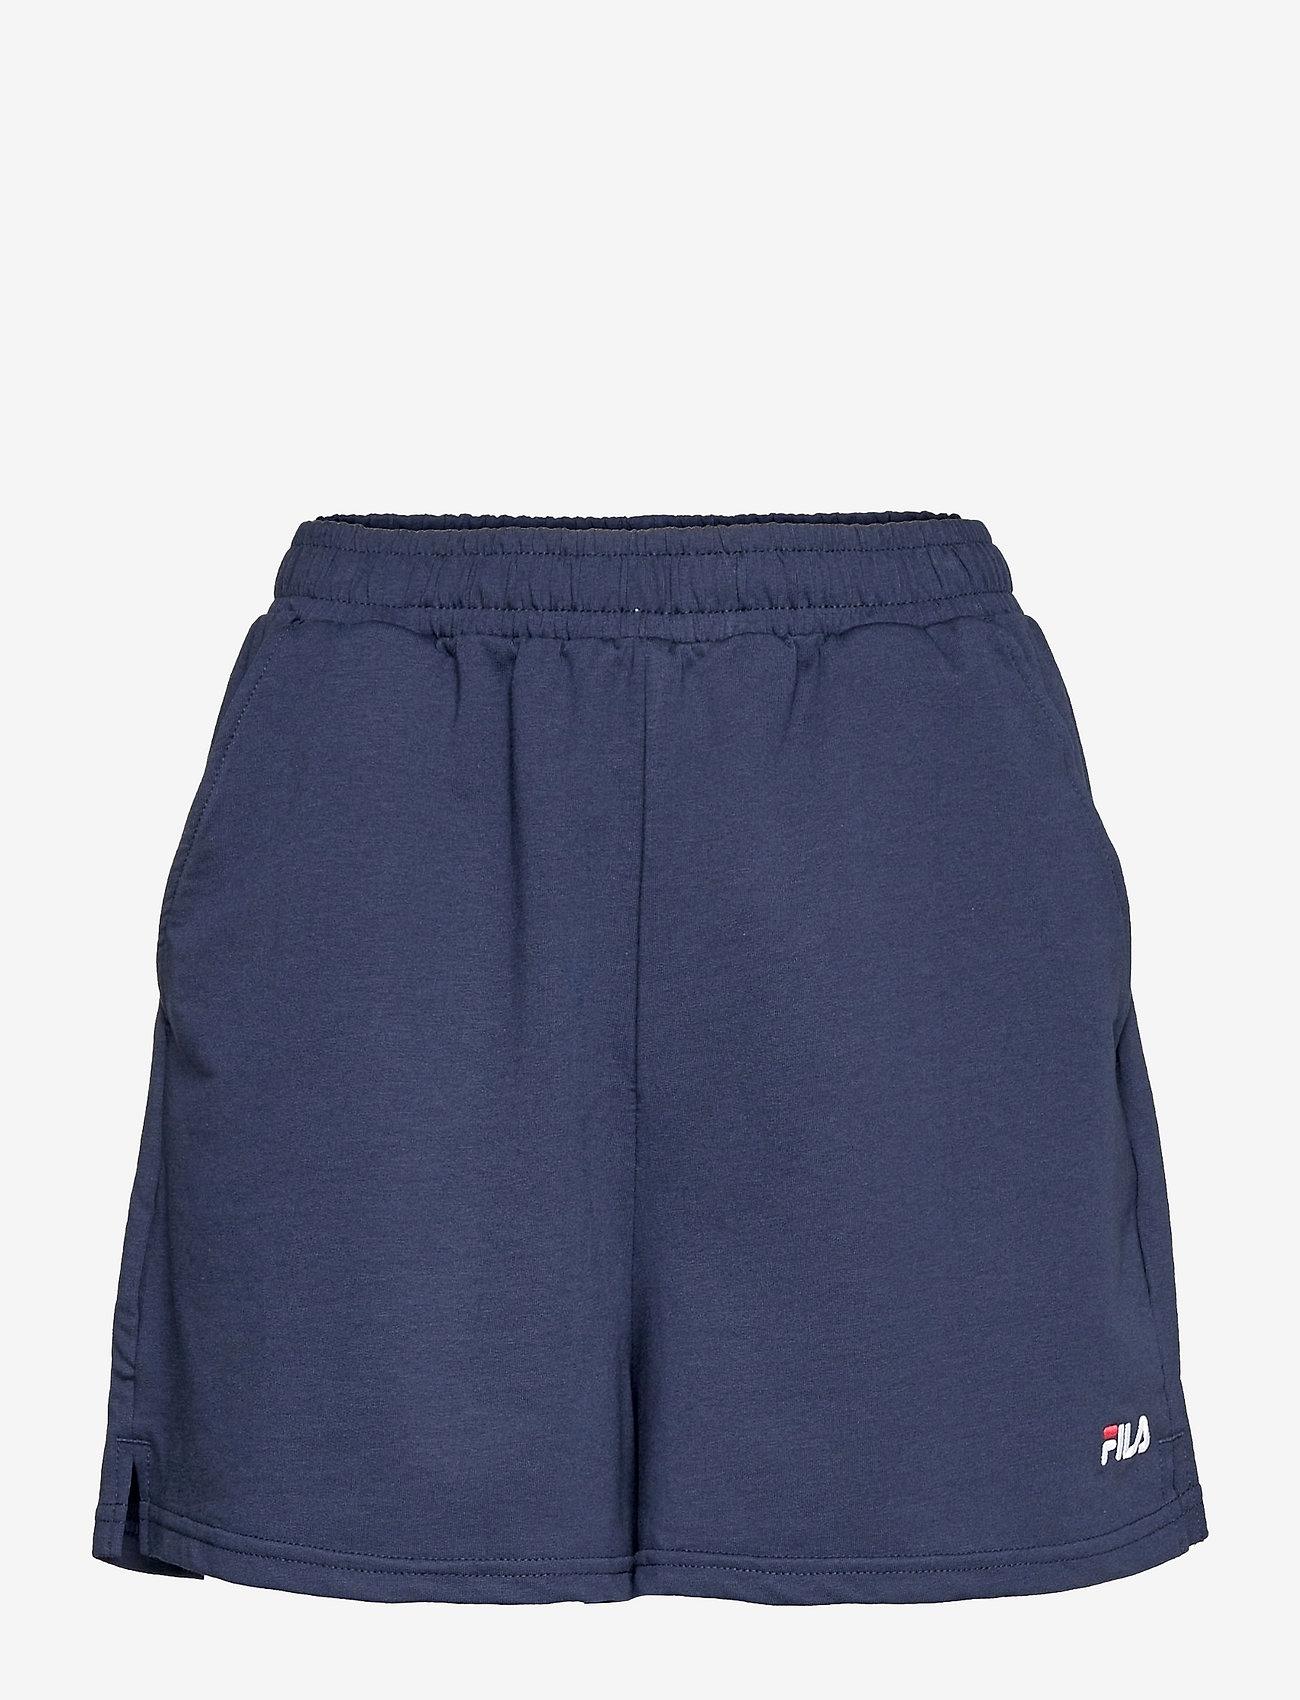 FILA - EDEL shorts high waist - chaussures de course - black iris - 0